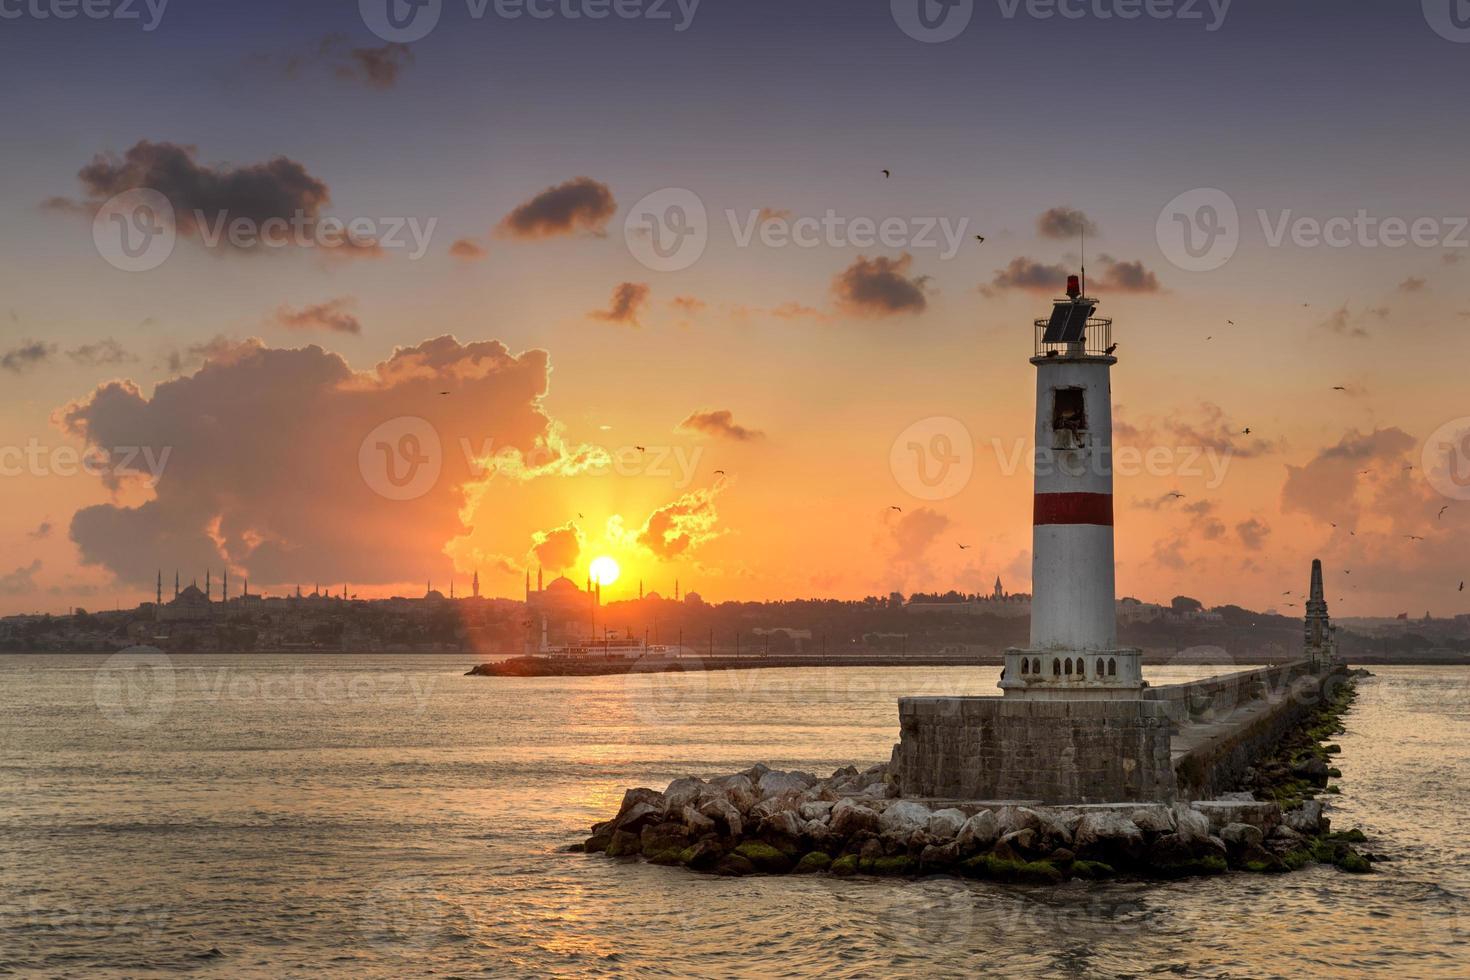 Sonnenuntergang in Istanbul, Truthahn foto